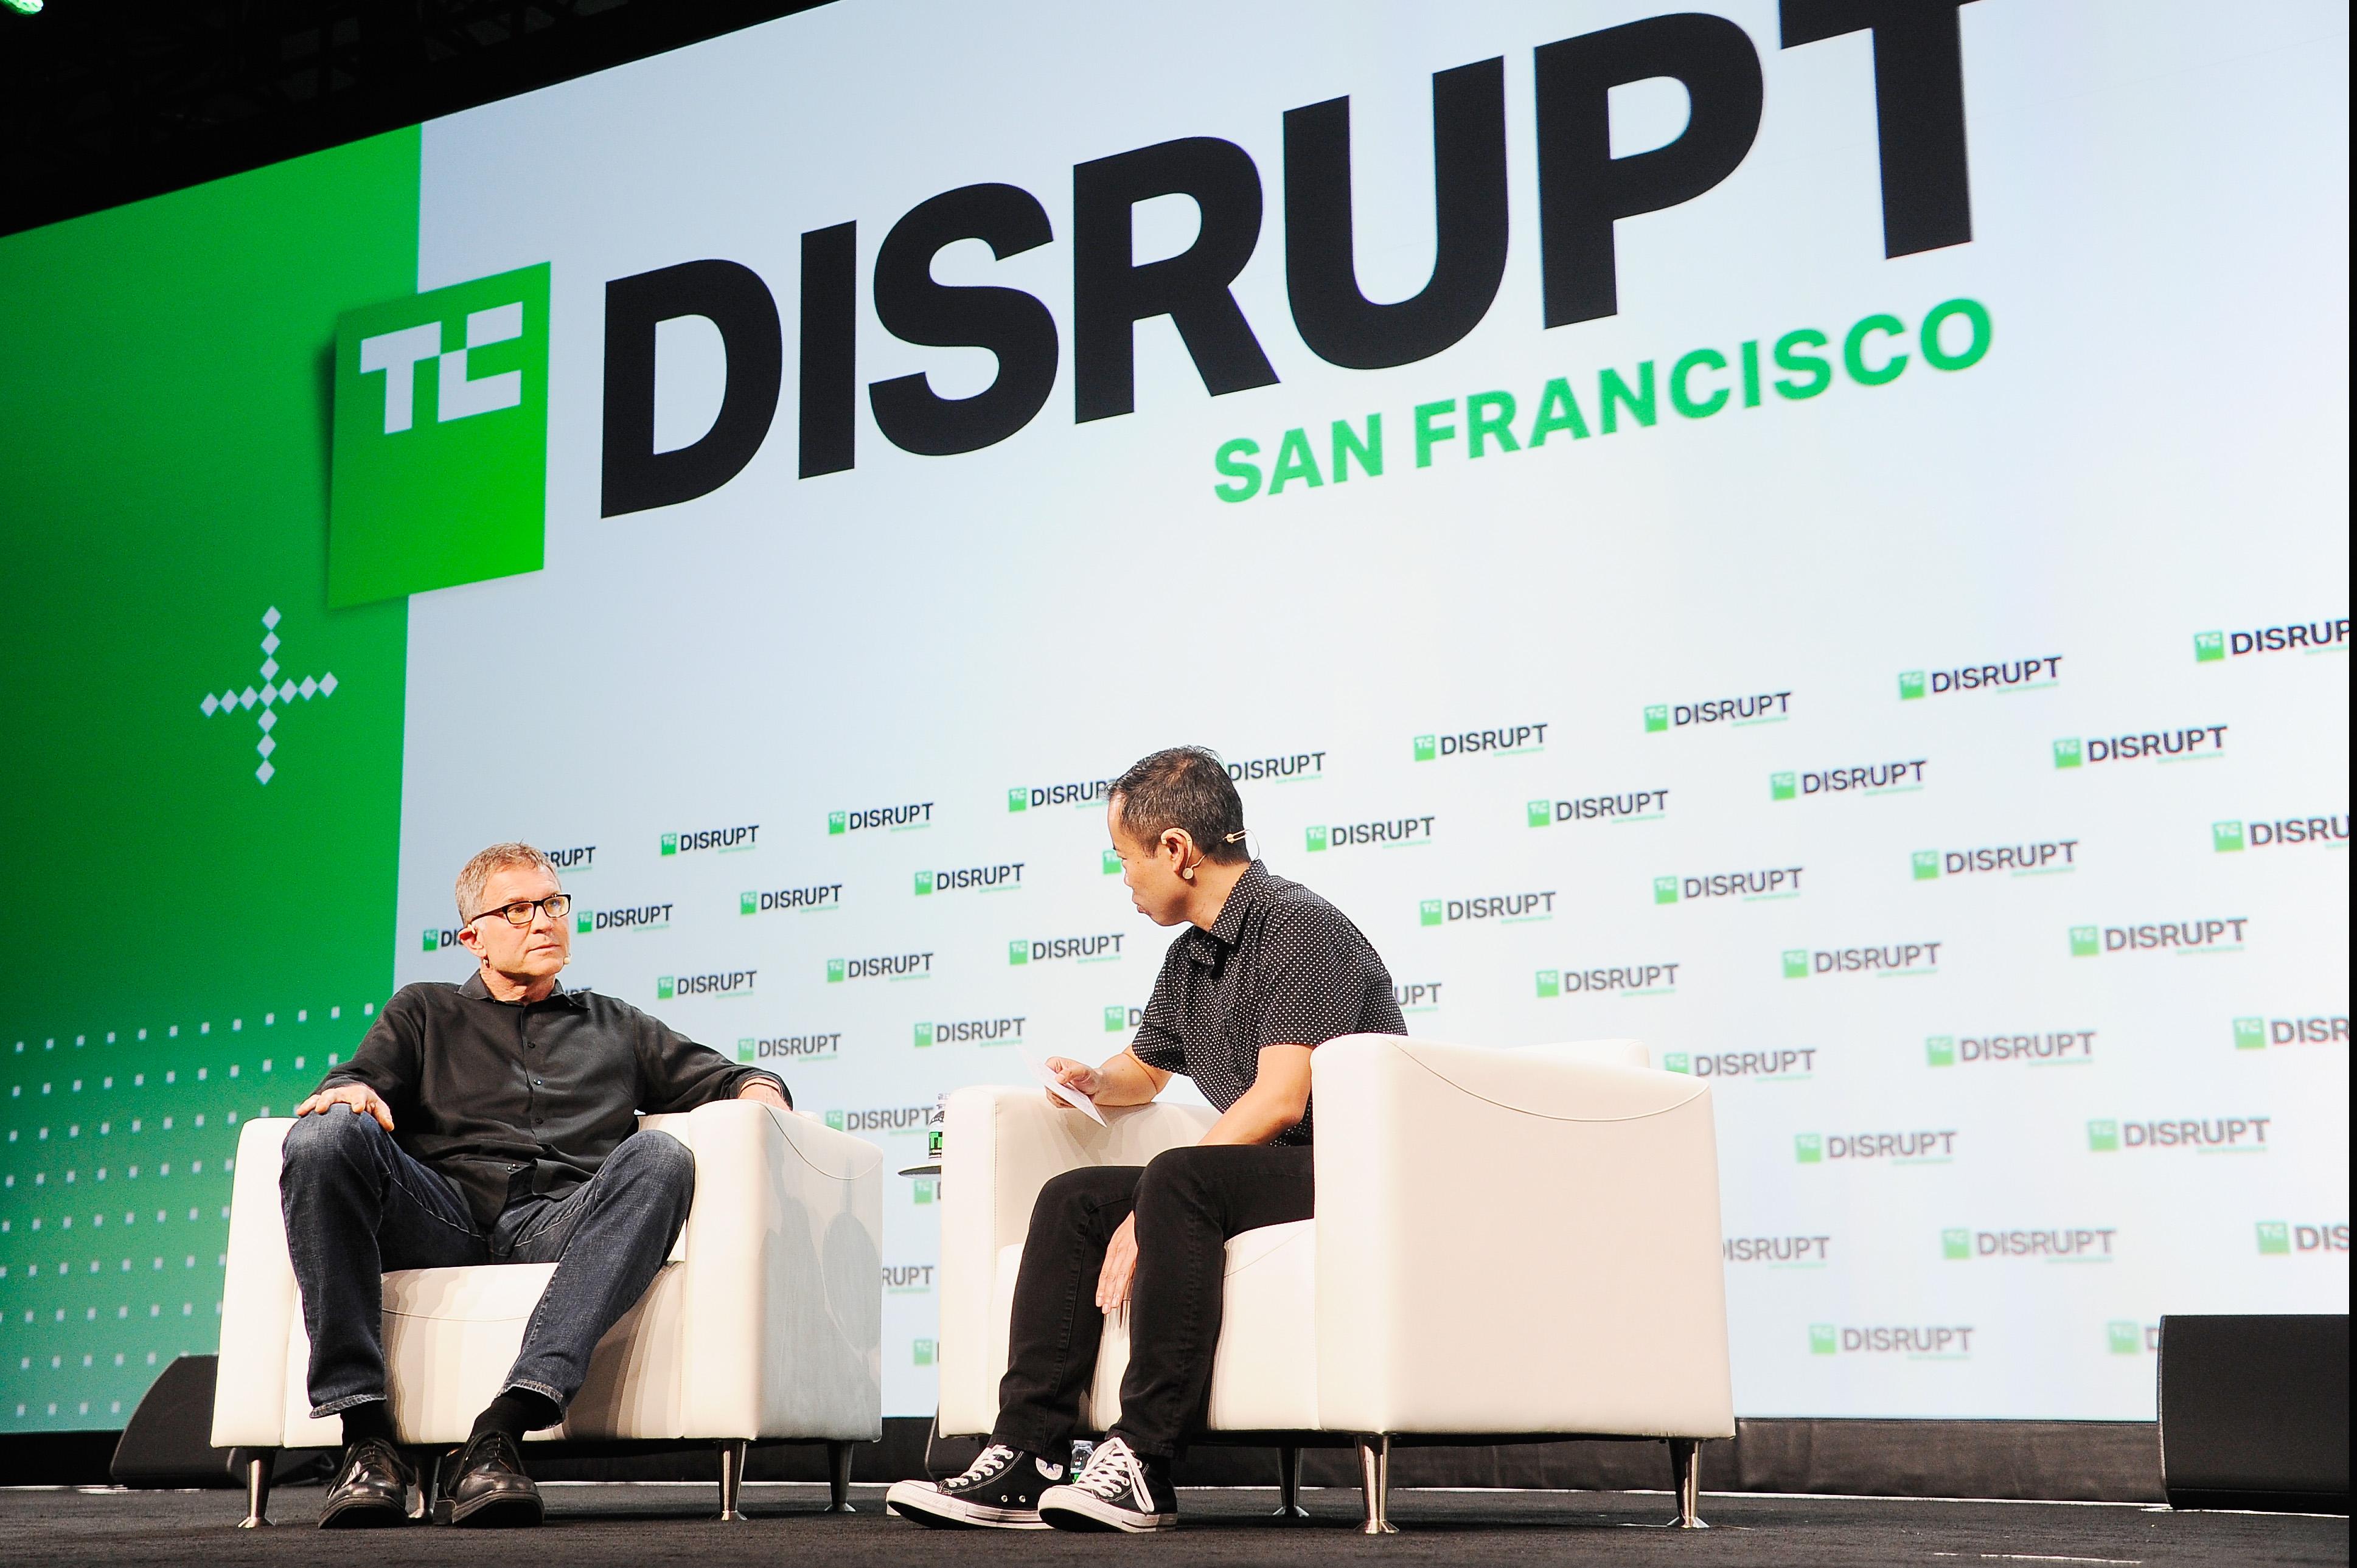 Francisco 2018 - day 1 (30633299368).jpg SAN FRANCISCO, CA - SEPTEMBER 05: Roblox Corporation Founder and CEO David Baszucki (L) and moderator Anthony Ha